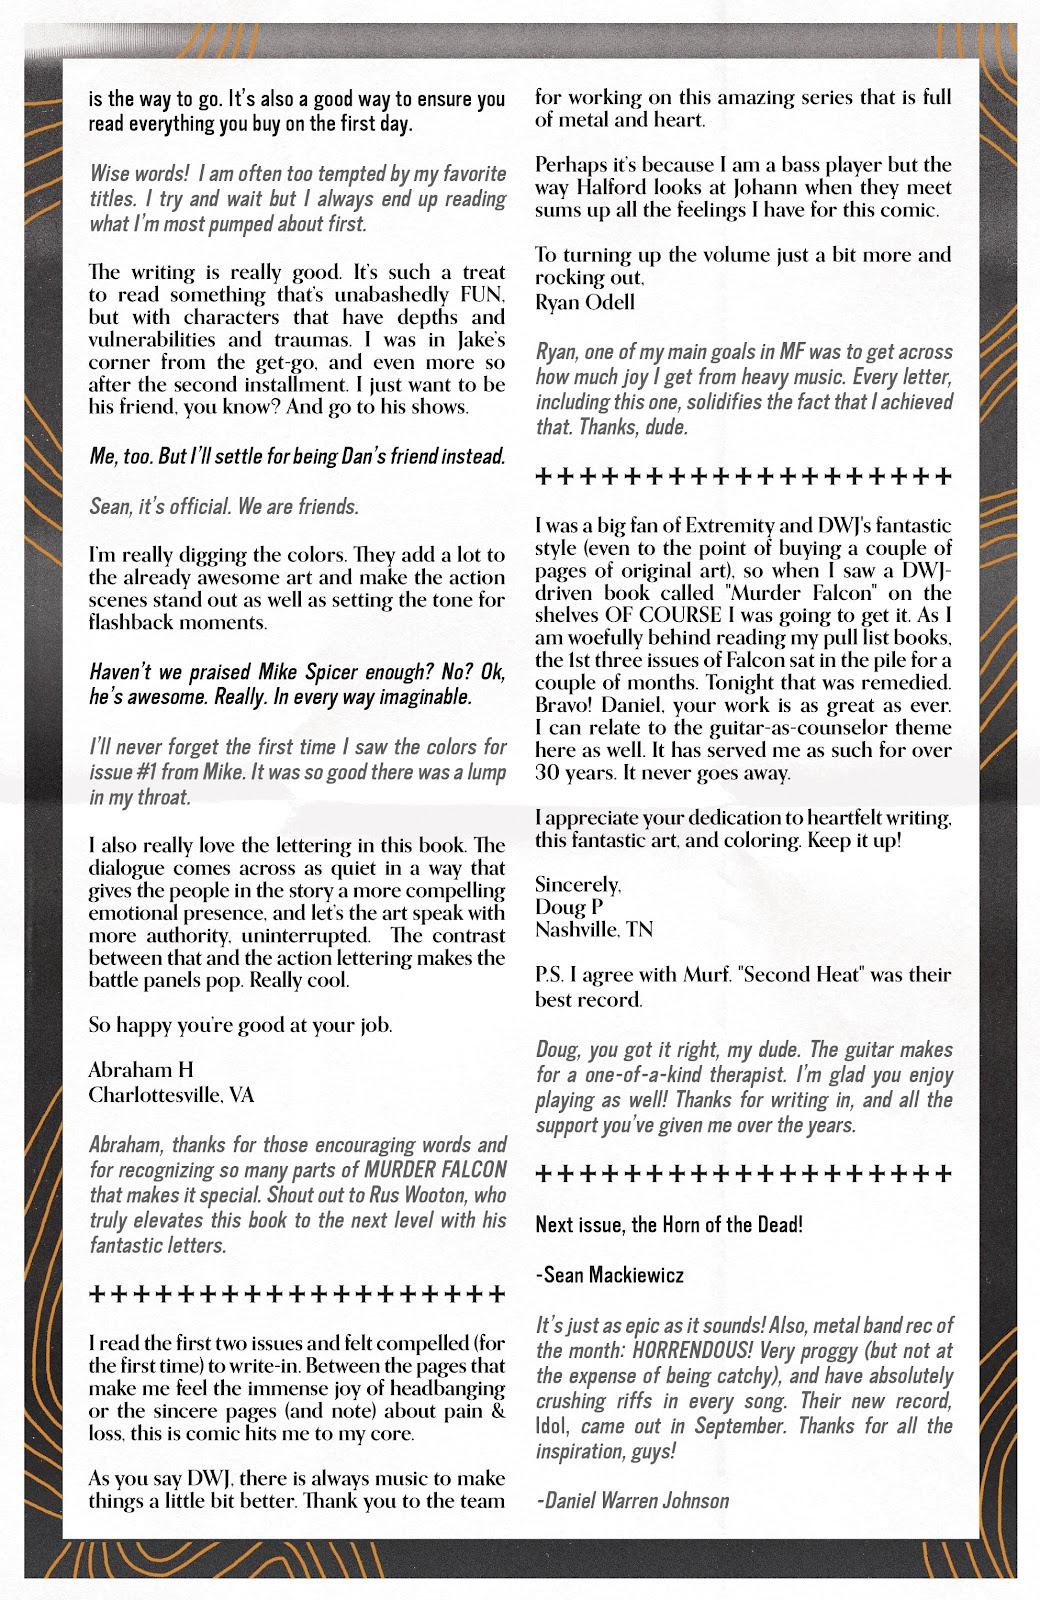 Read online Murder Falcon comic -  Issue #5 - 30